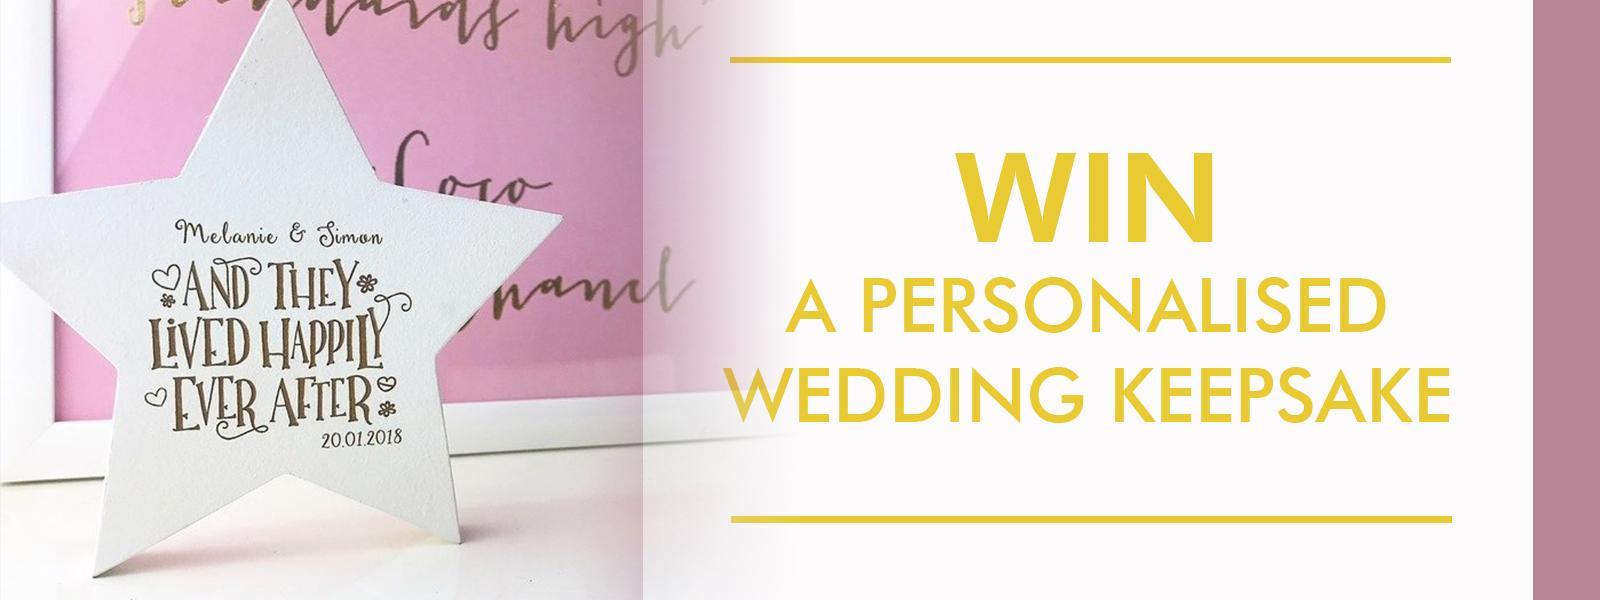 Win a wedding keepsake